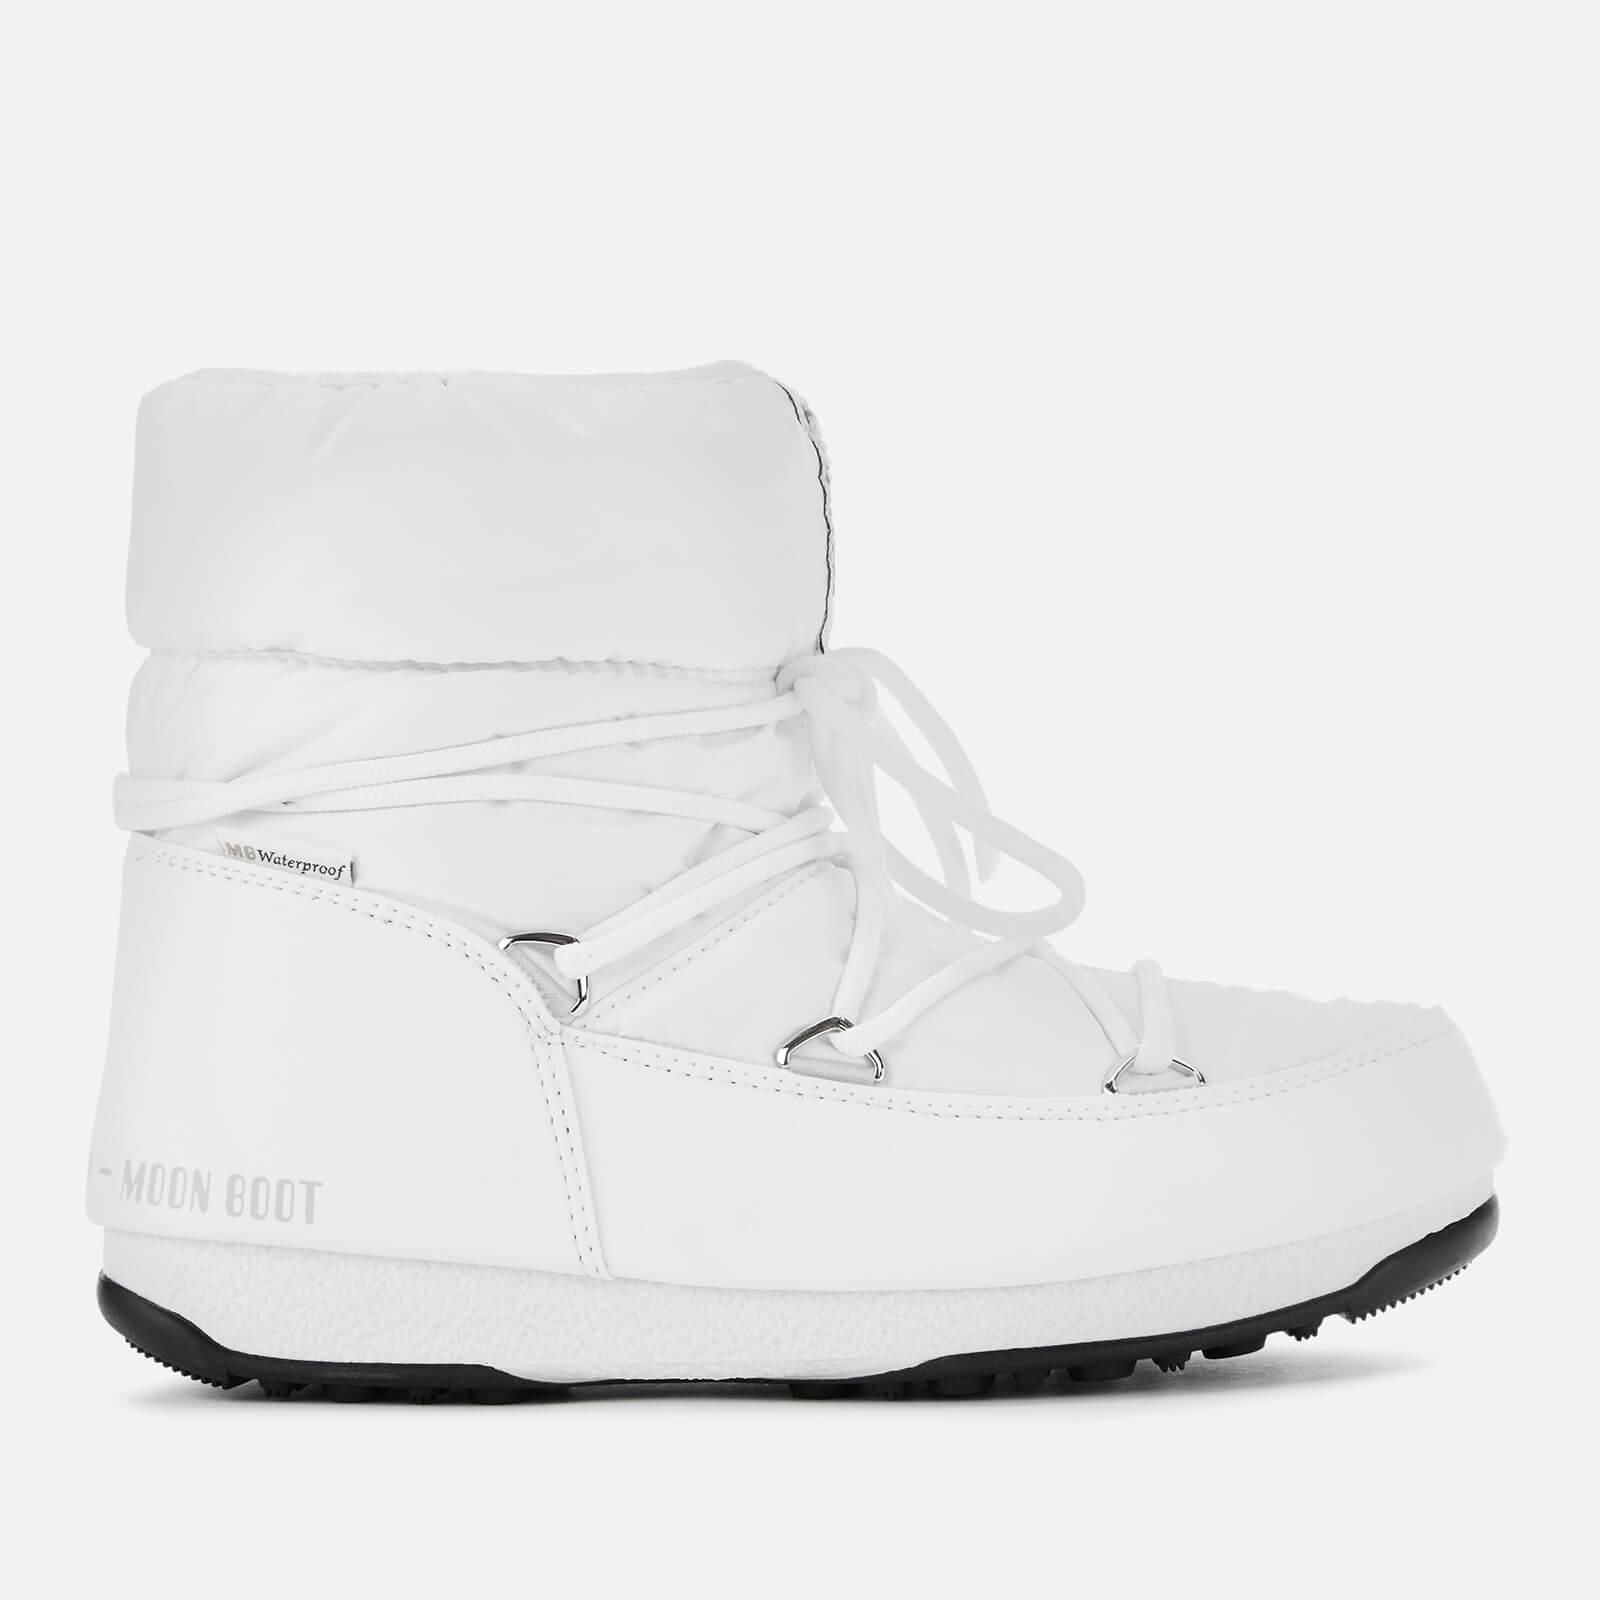 Moon Boot Women's Low Nylon Waterproof 2 Boots - White - EU 40/UK 7